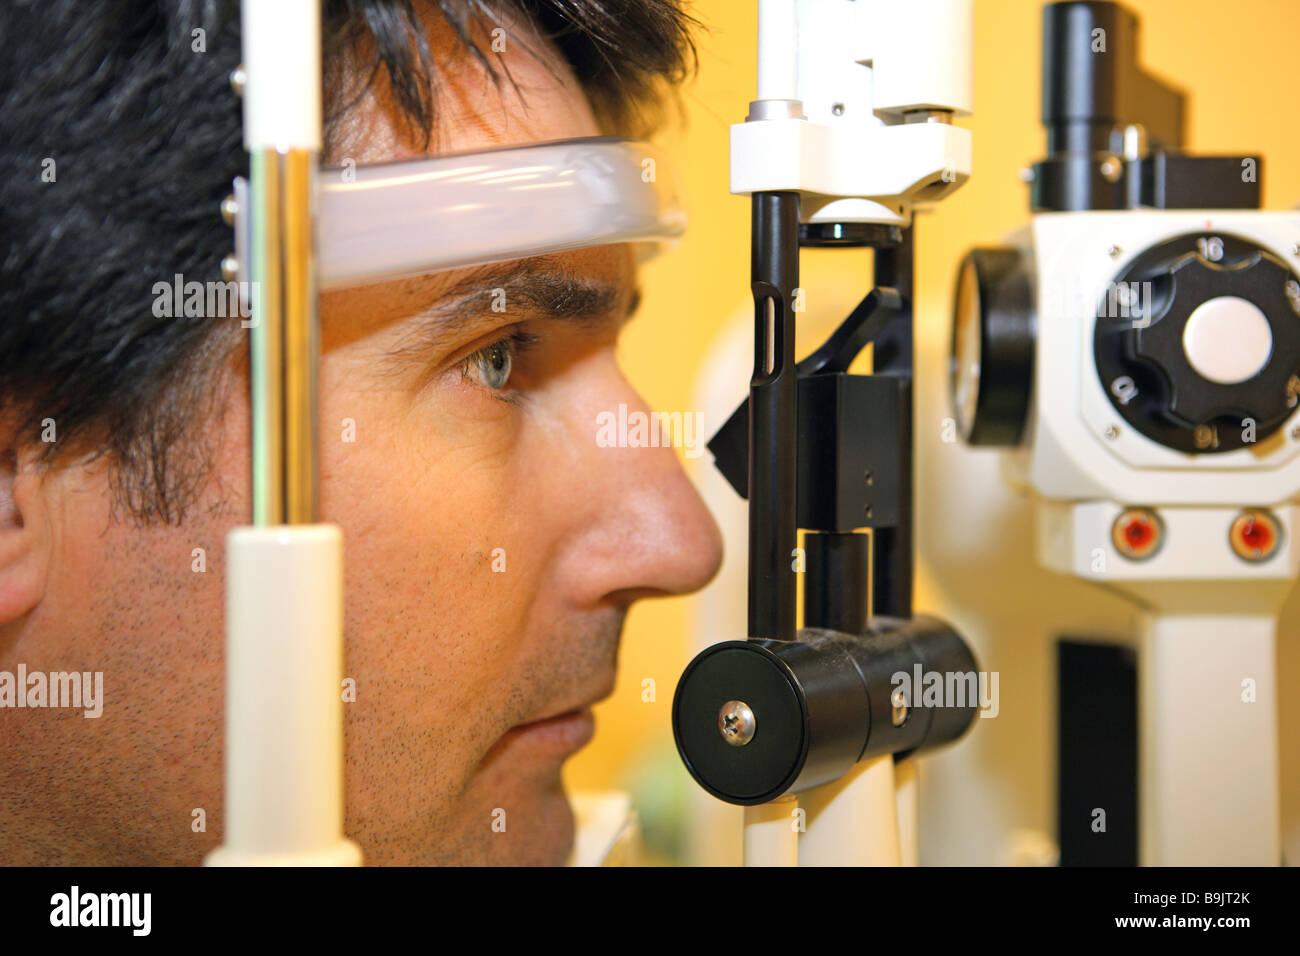 Man eye-diagnosis  Doctor's office eye eyes eye specialist eye-diagnosis optometry eye-examination ophthalmologic - Stock Image